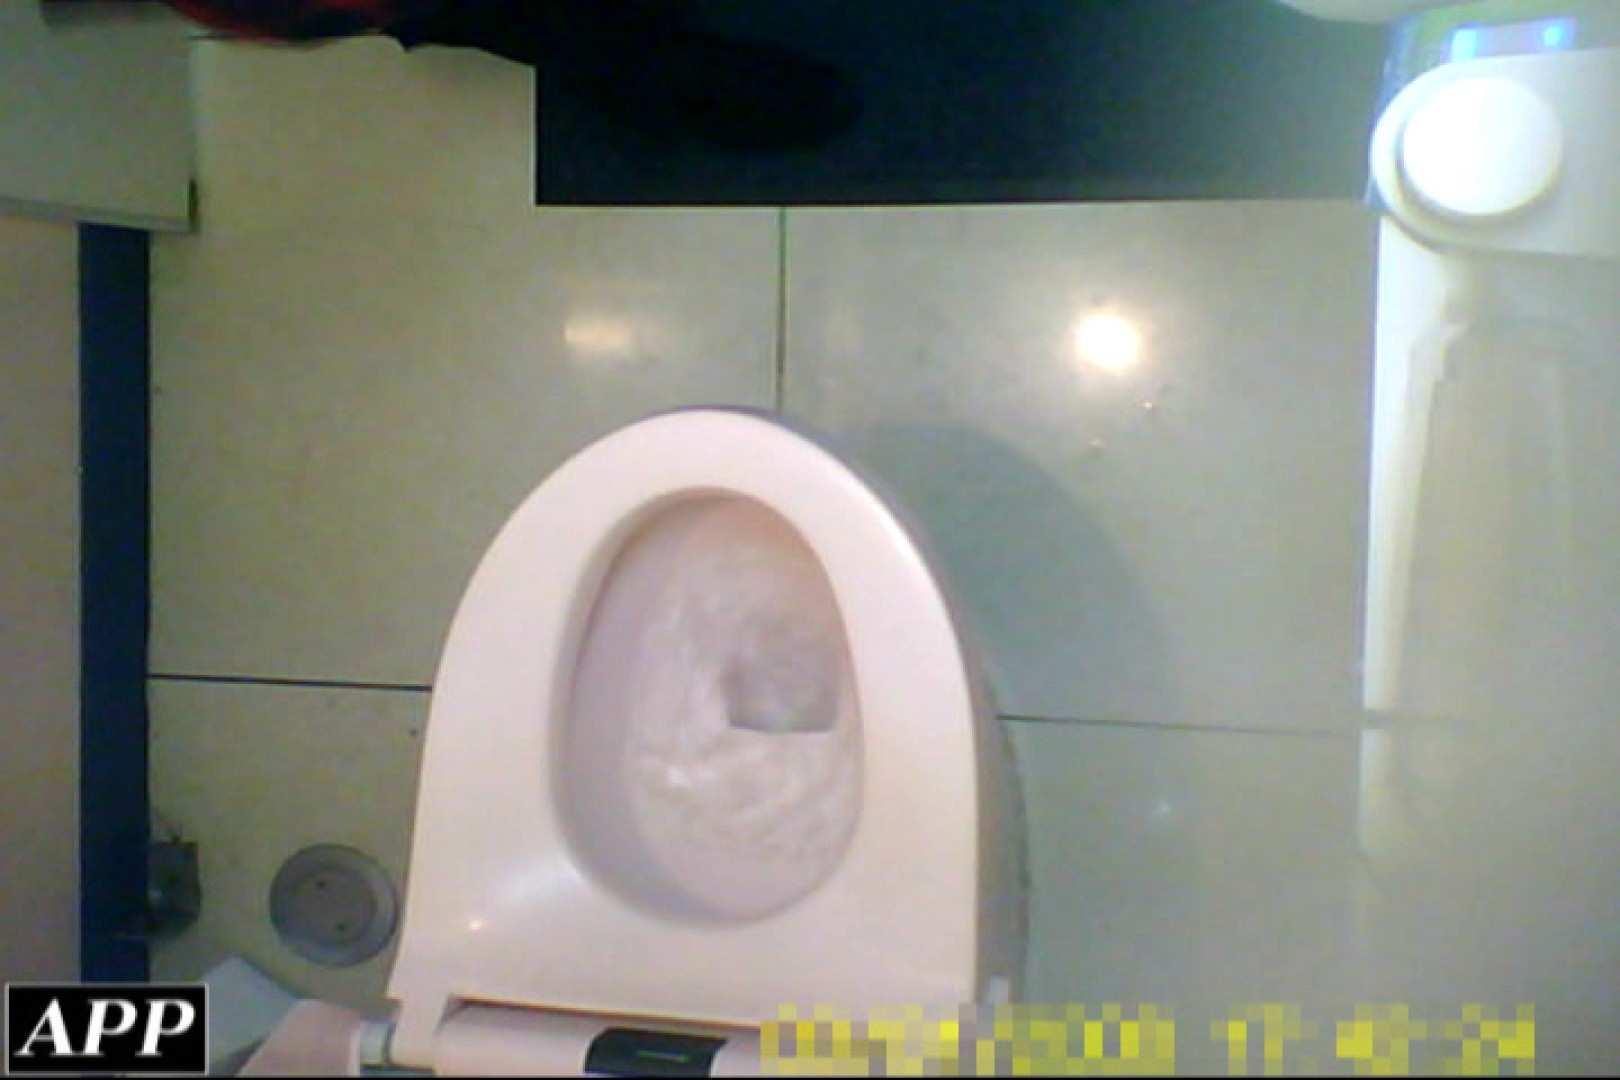 3視点洗面所 vol.004 OLエロ画像  107PICs 20